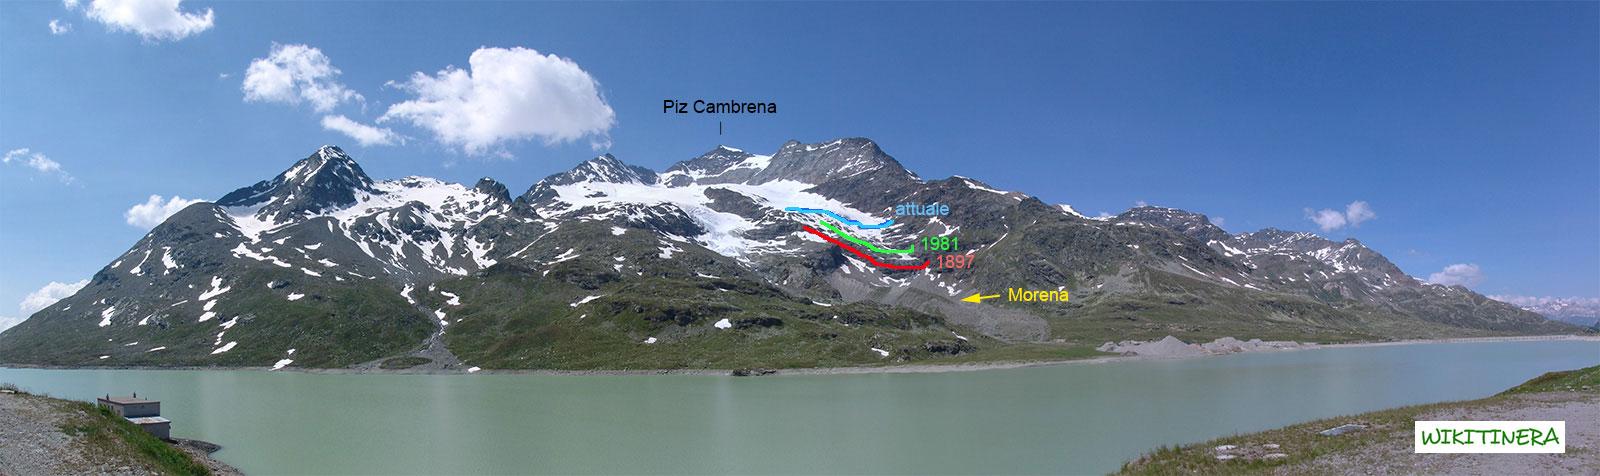 Paesaggio di Piz Bernina